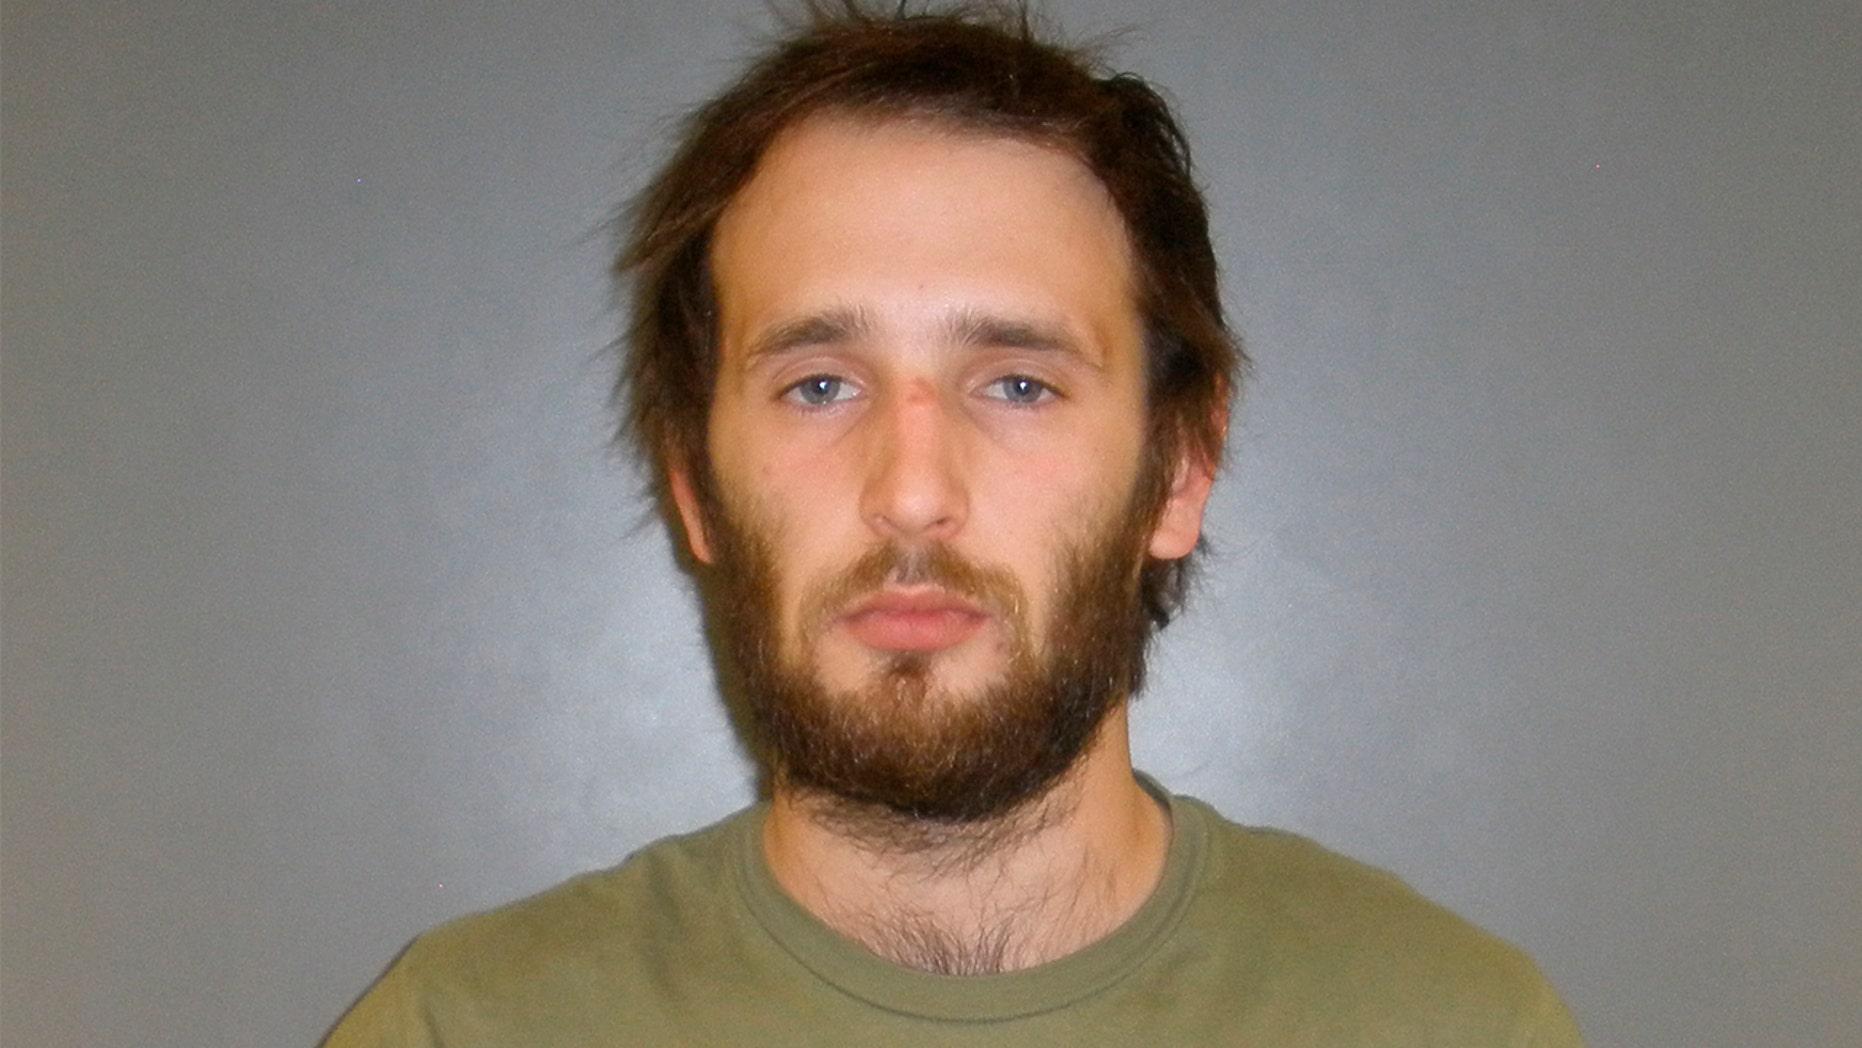 Sean Penn and Robin Wright's son, Hopper Penn, pleaded no contest to a misdemeanor in a Nebraska drug possession case.